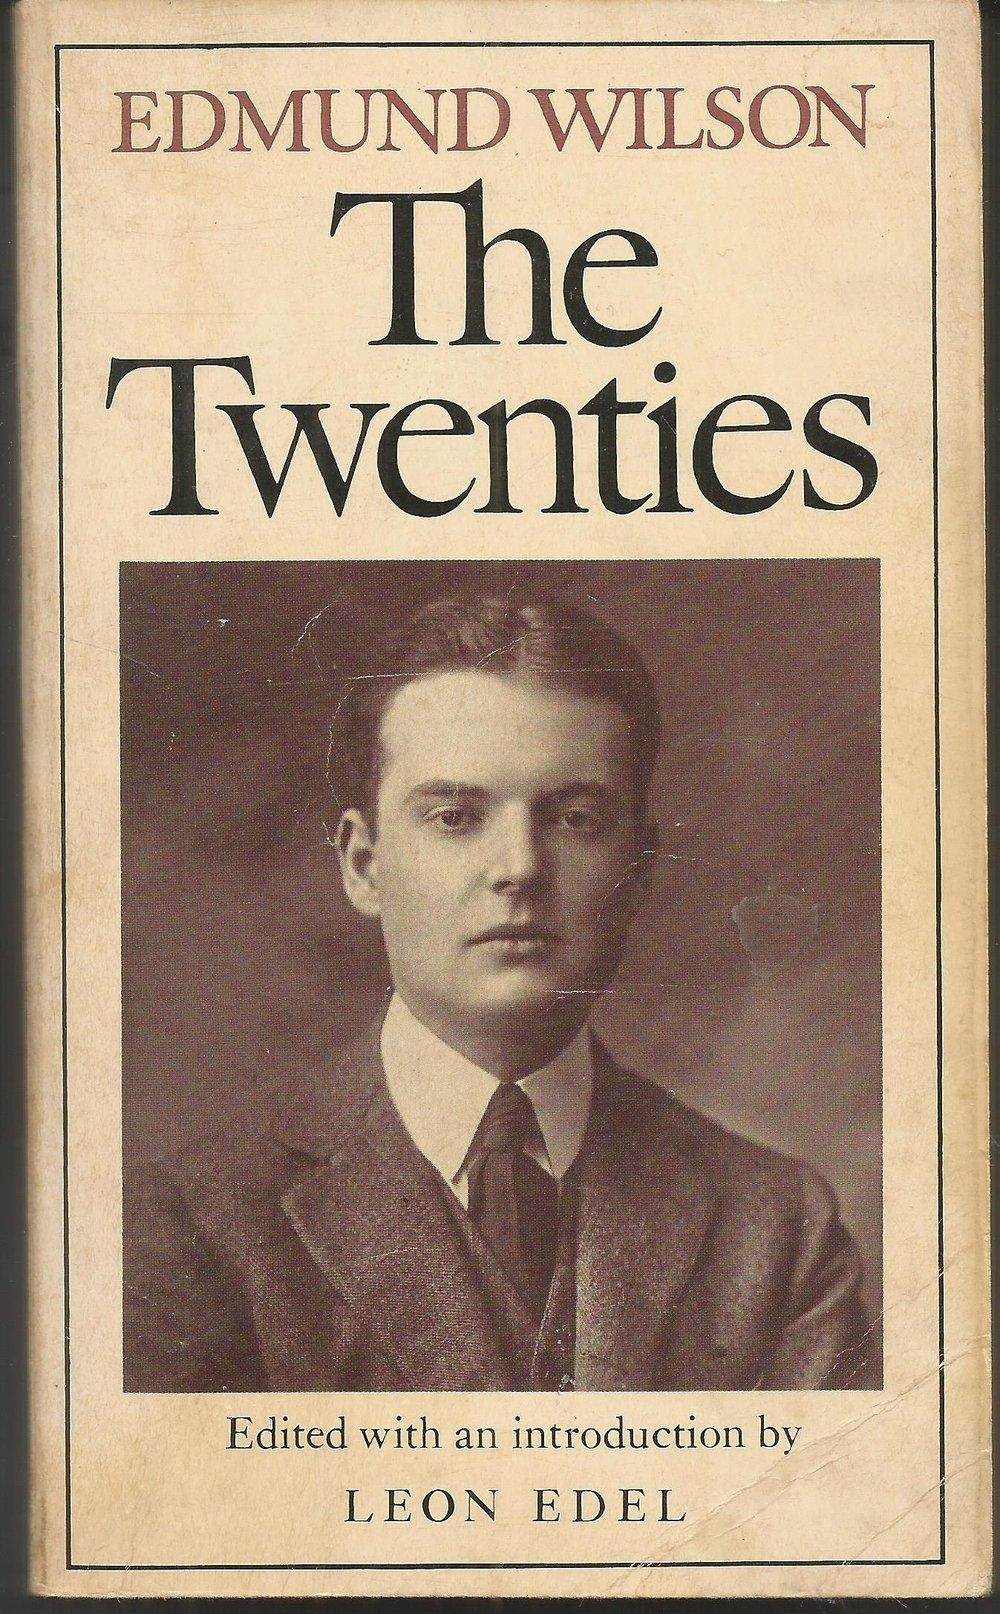 Edmund Wilson - The Twenties